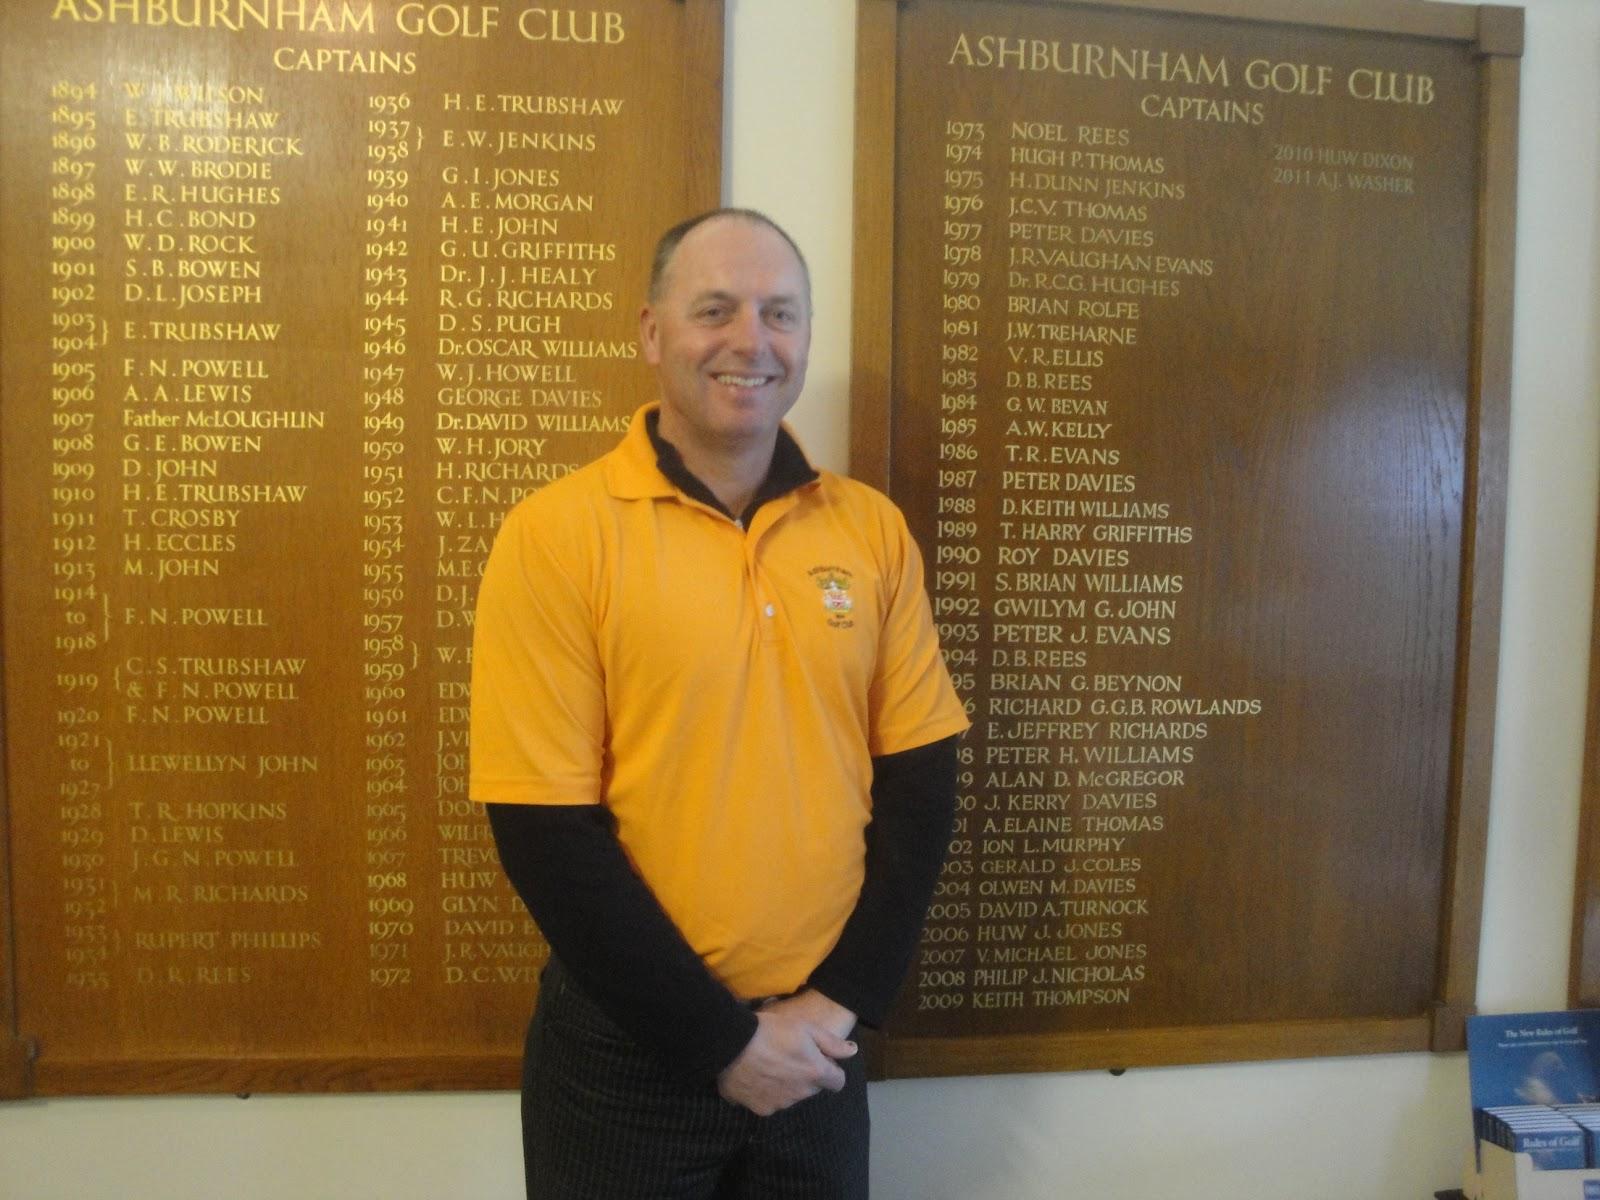 Ashburnham Golf Club: 2012